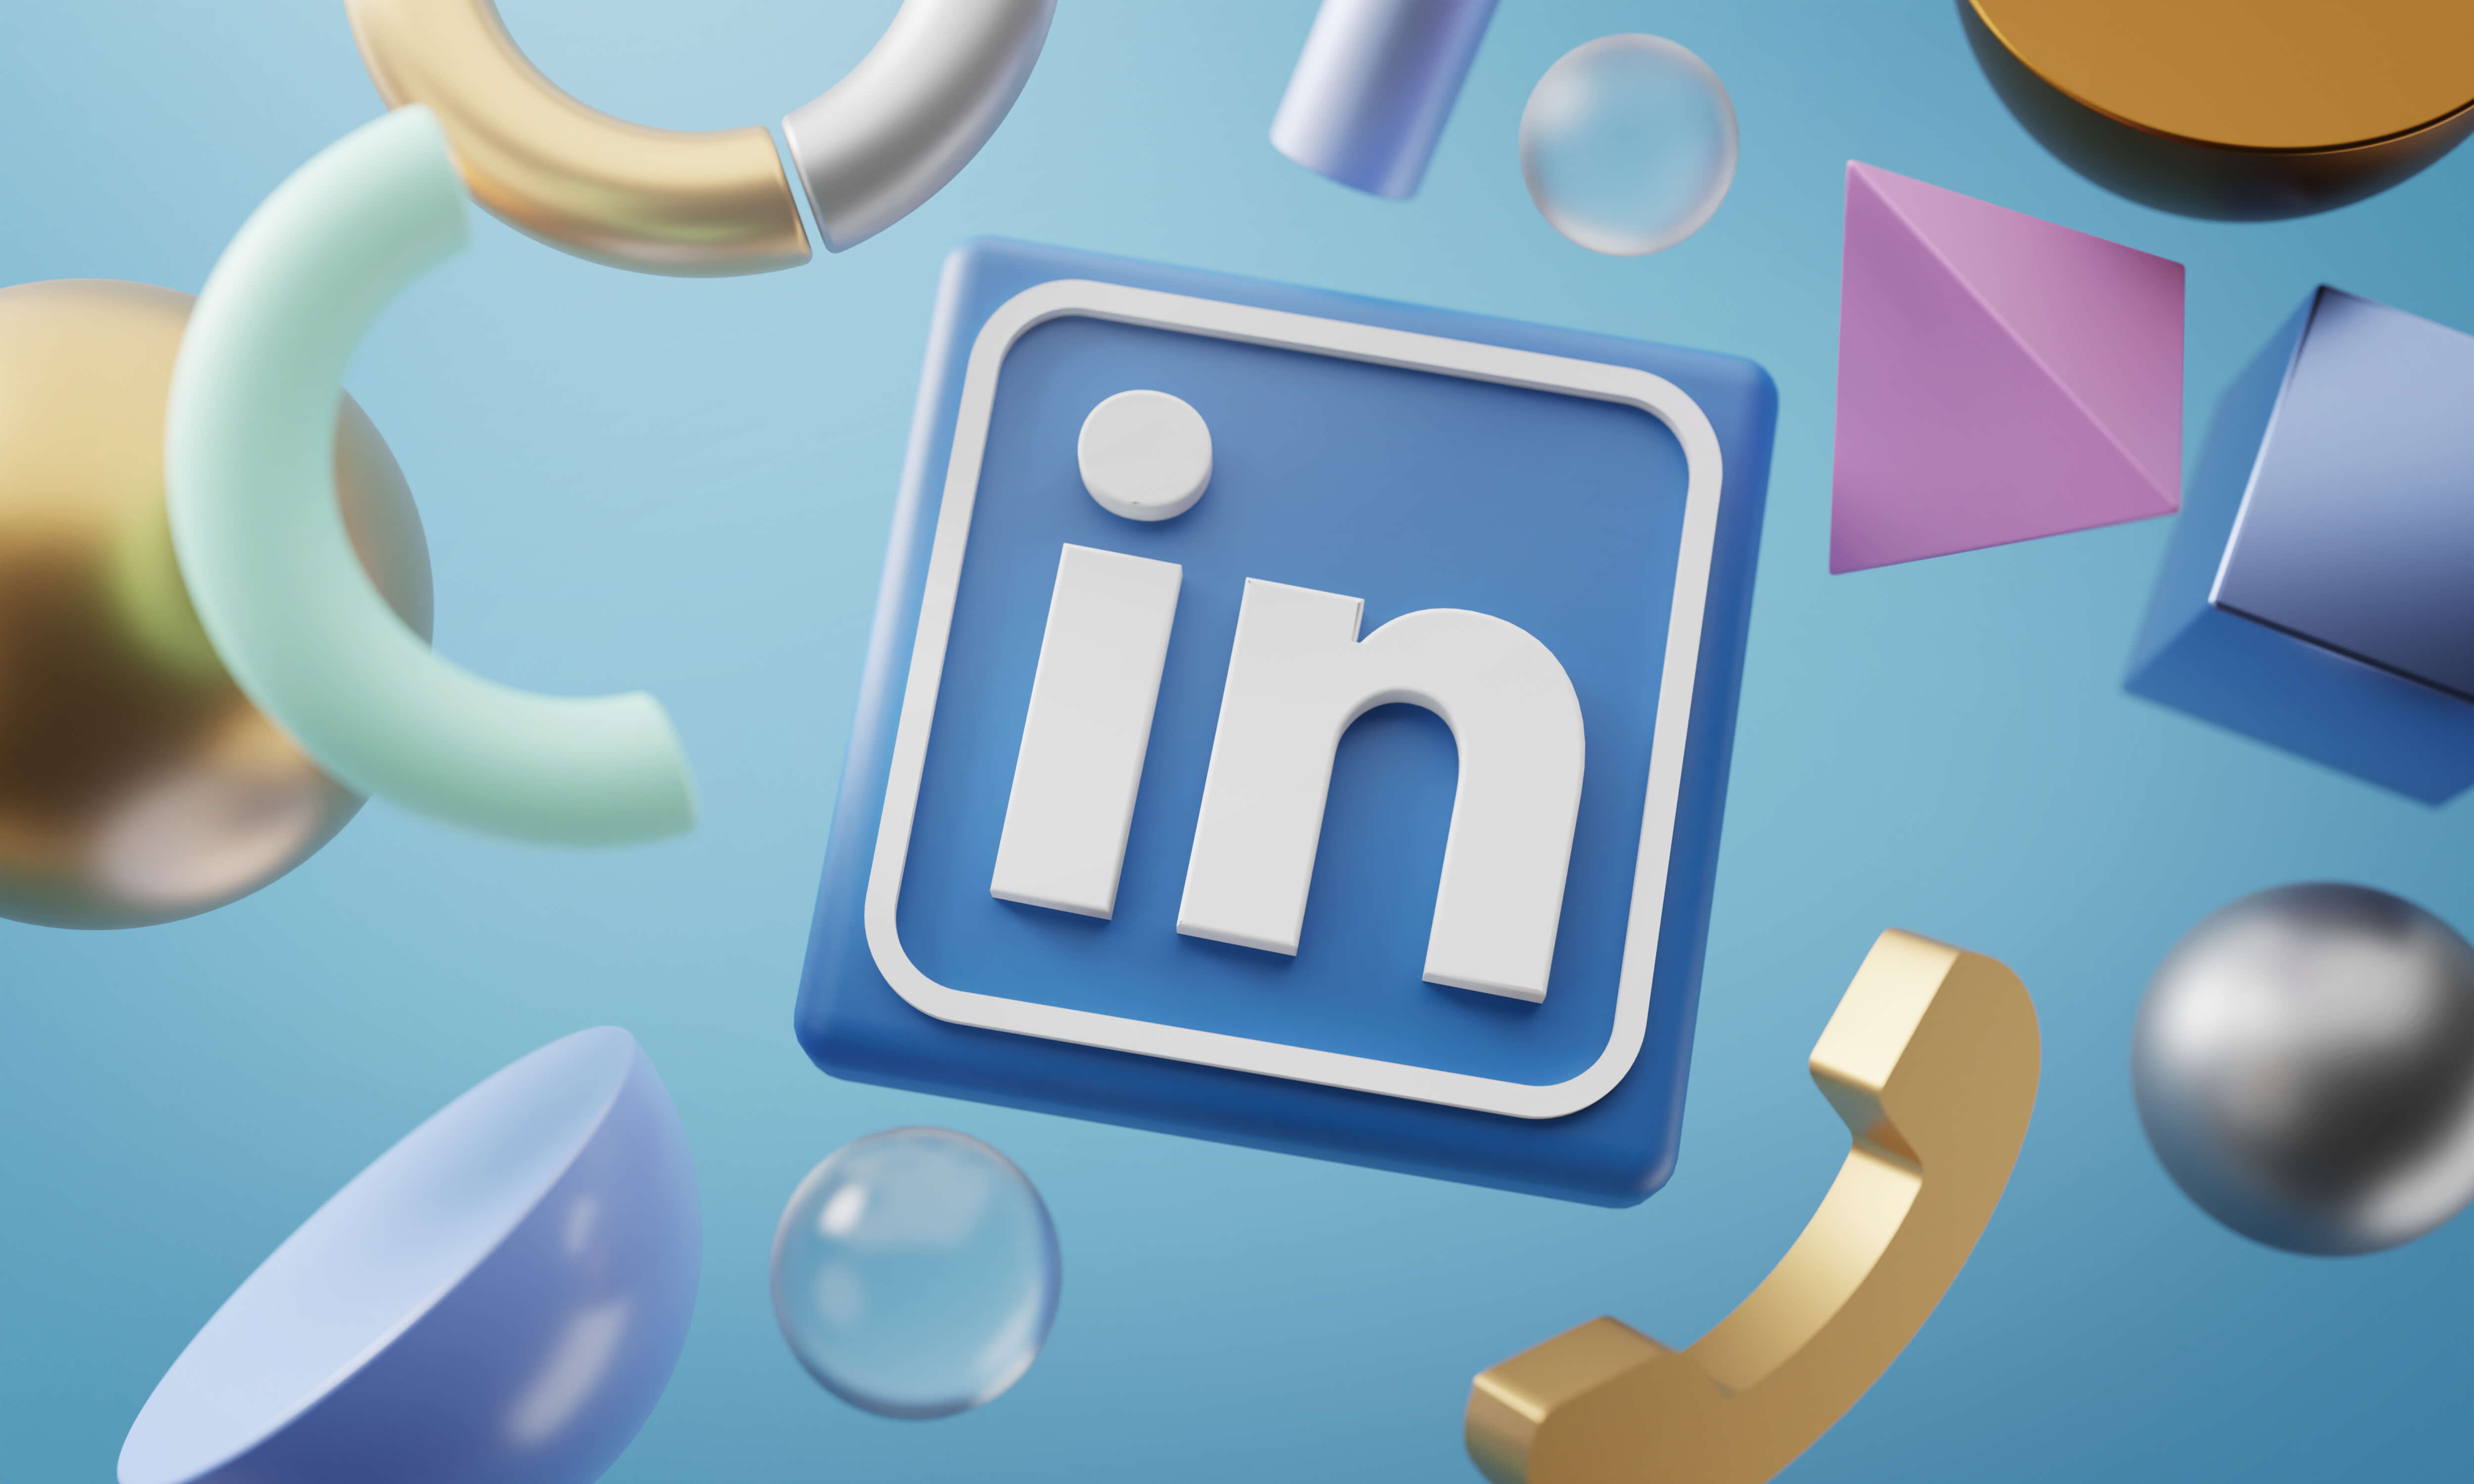 Otimize o seu perfil na rede social Linkedin profissional